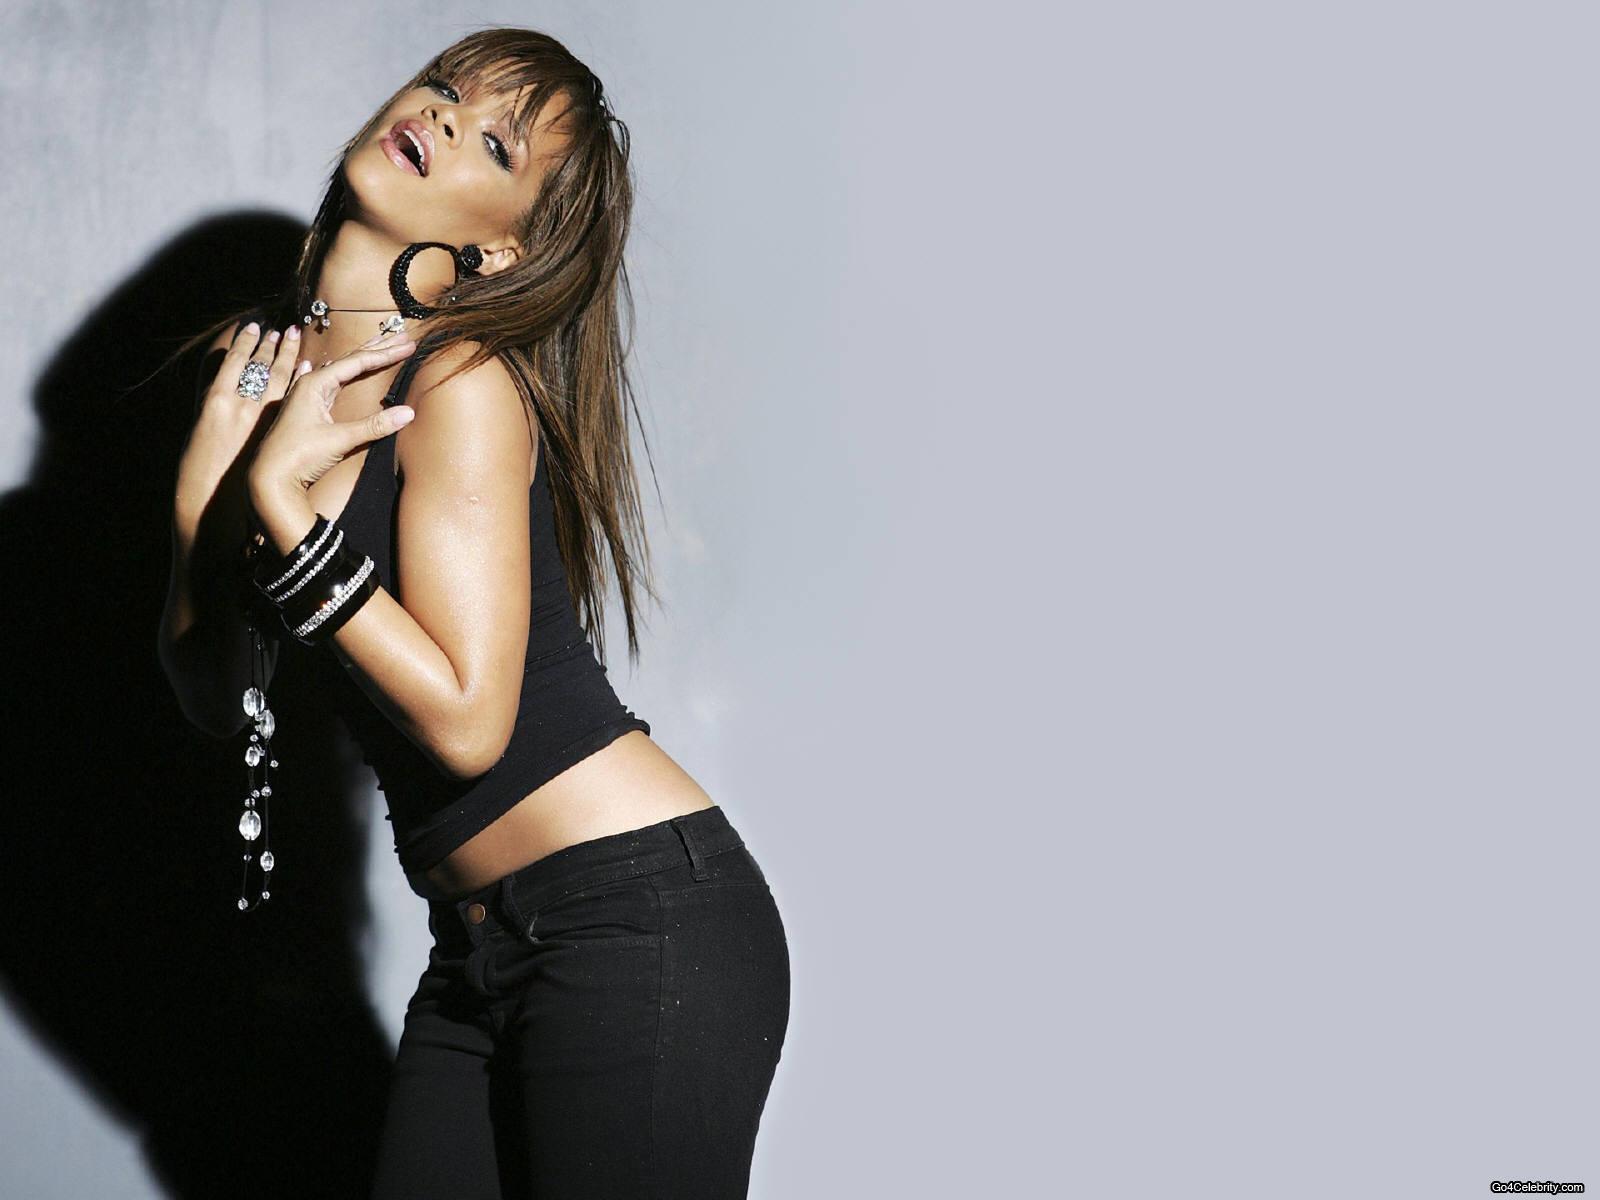 http://images2.fanpop.com/images/photos/6800000/Rihanna-rihanna-6848077-1600-1200.jpg